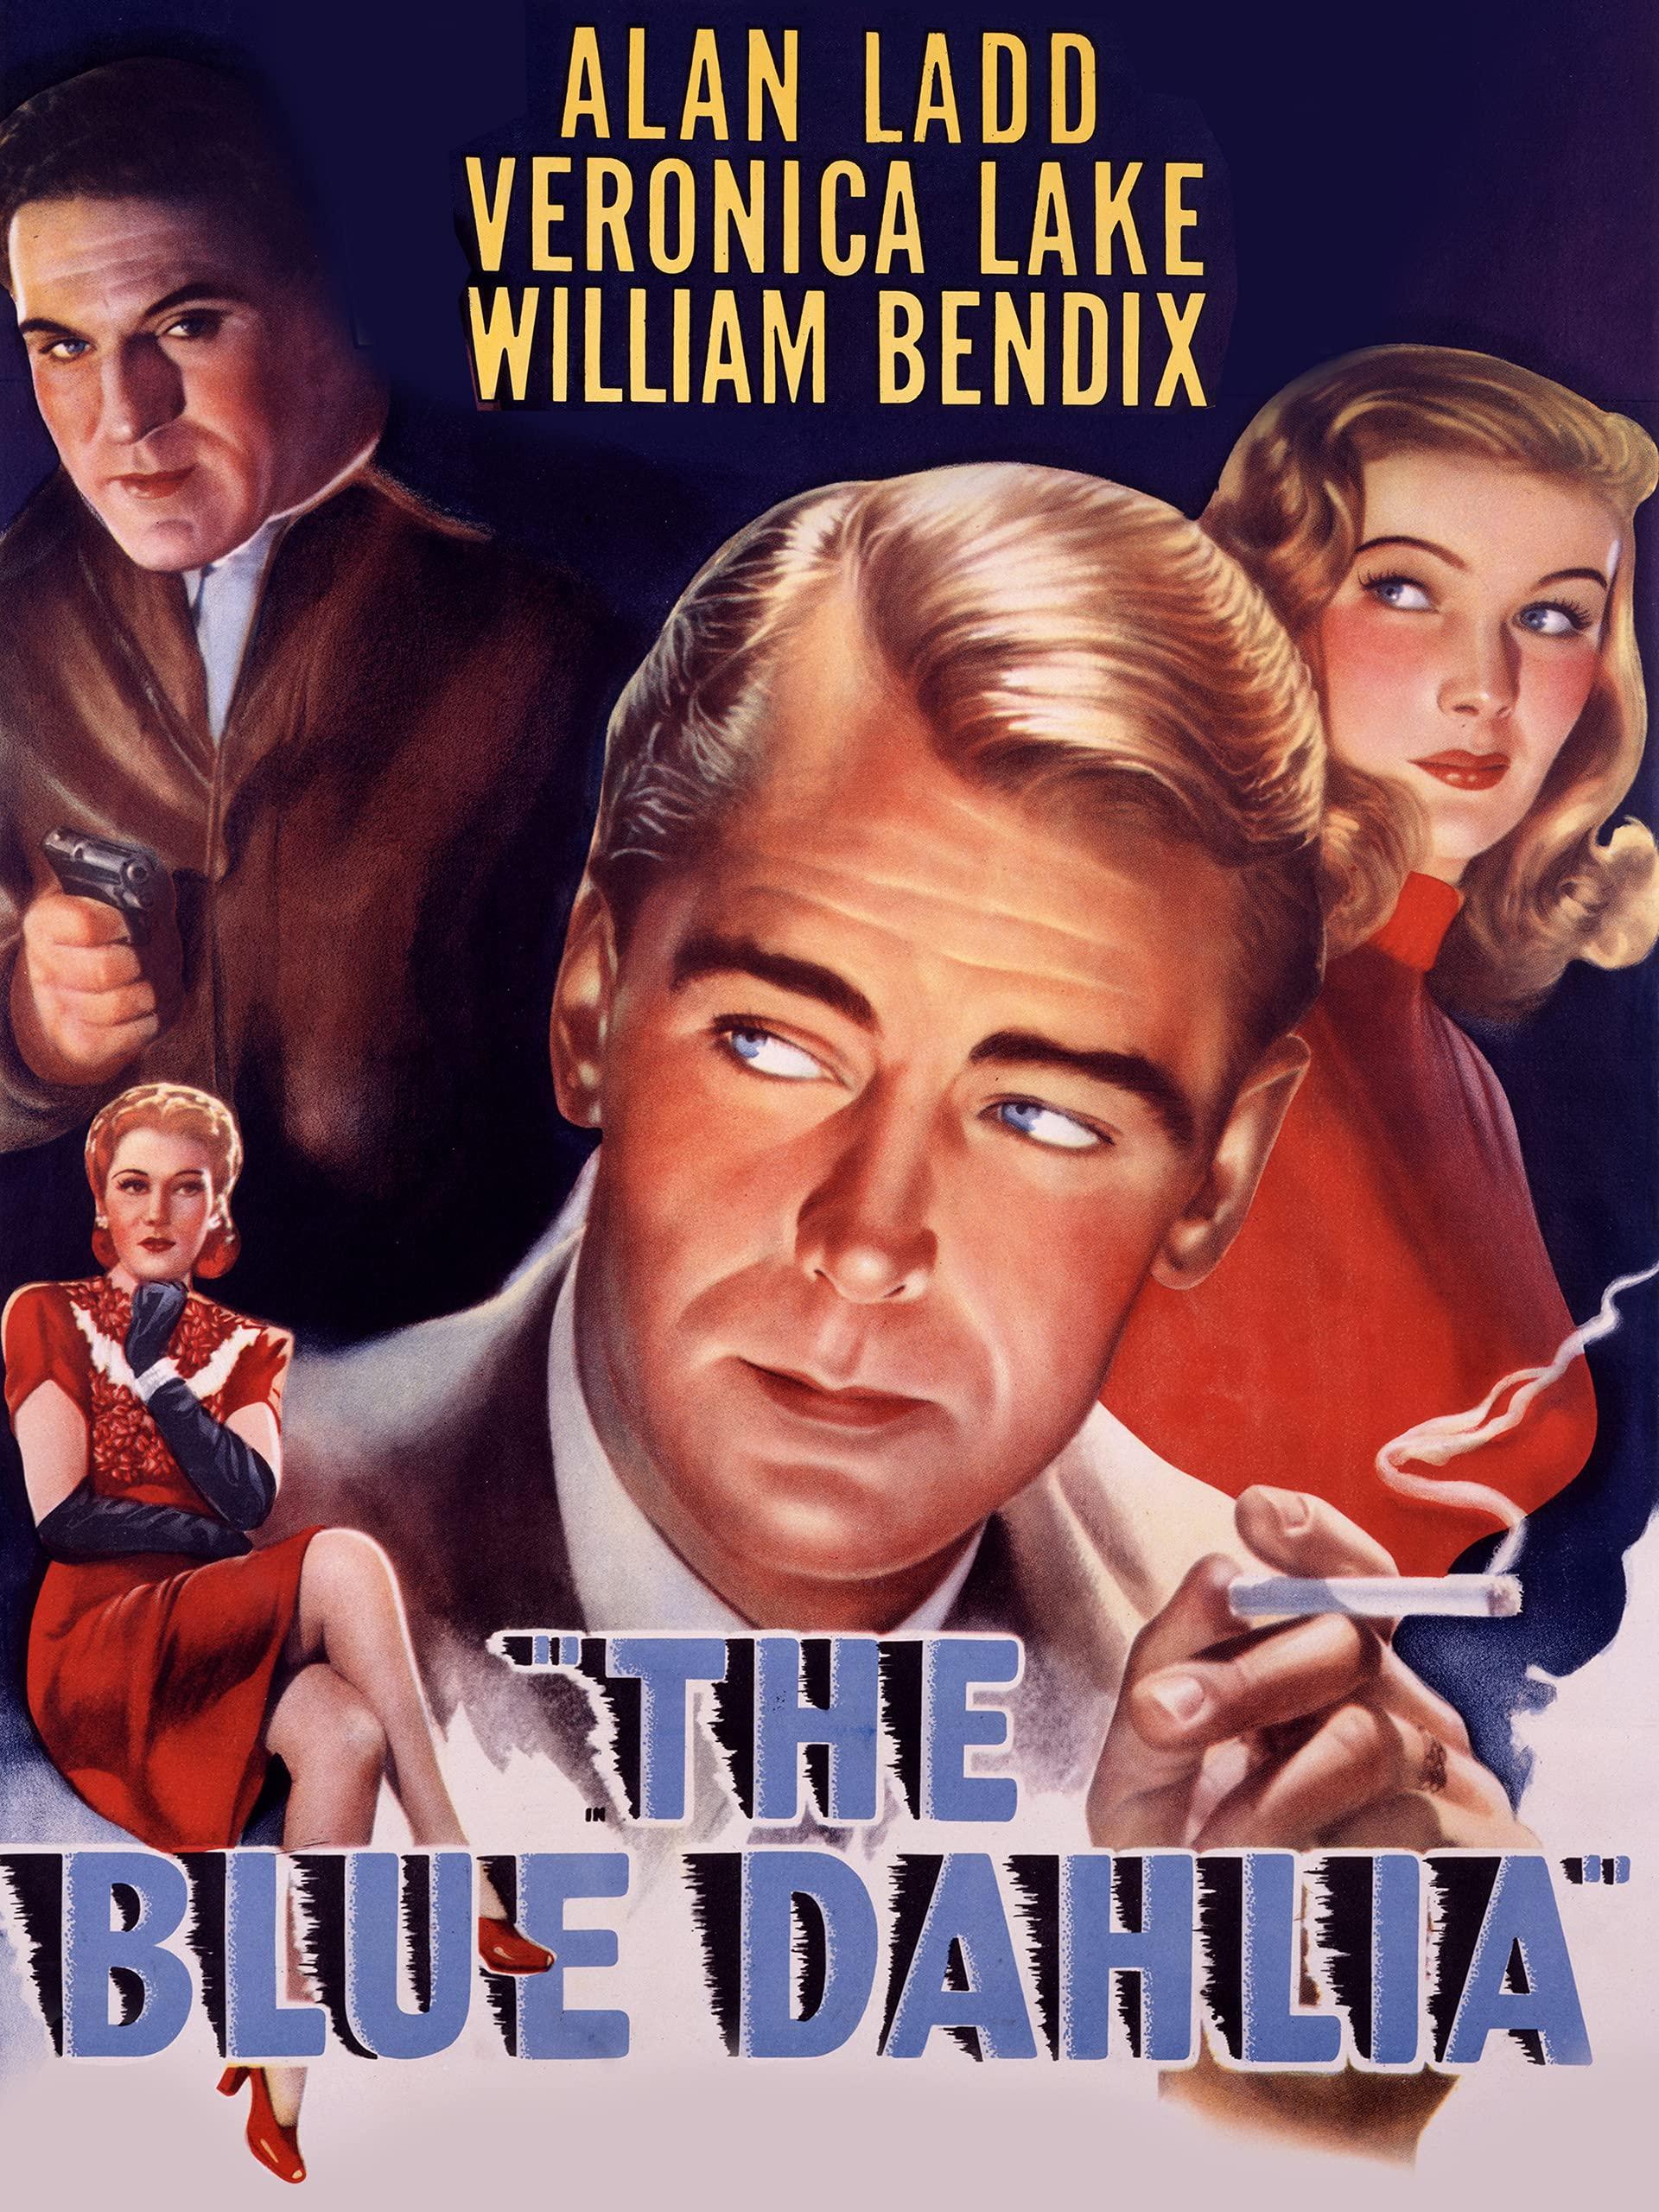 Veronica Lake Hollywood Film The Blue Dahlia T-Shirt George Marshall Alan Ladd